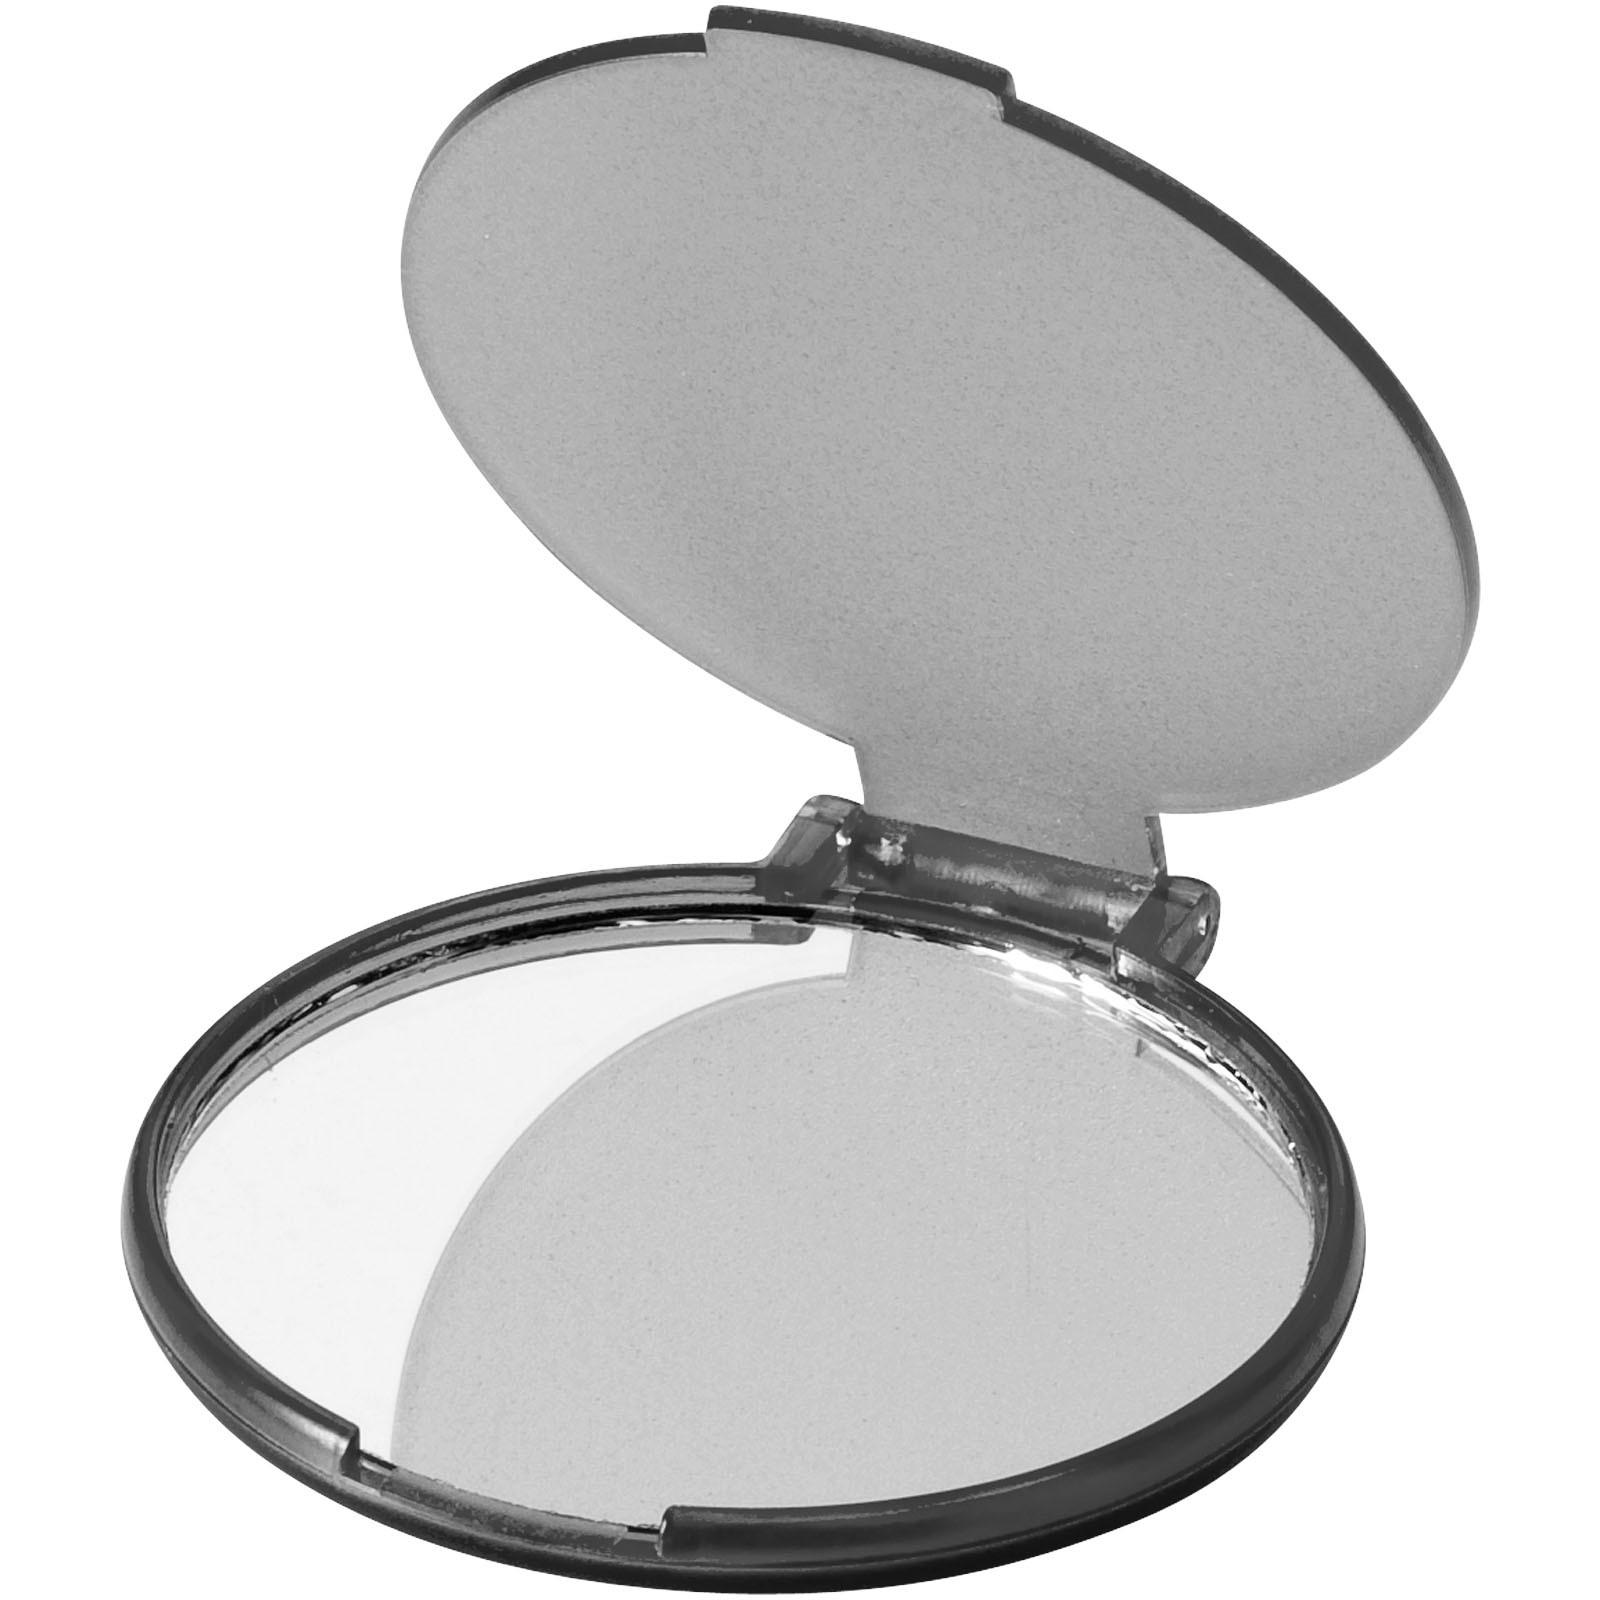 Carmen glamour mirror - Transparent black